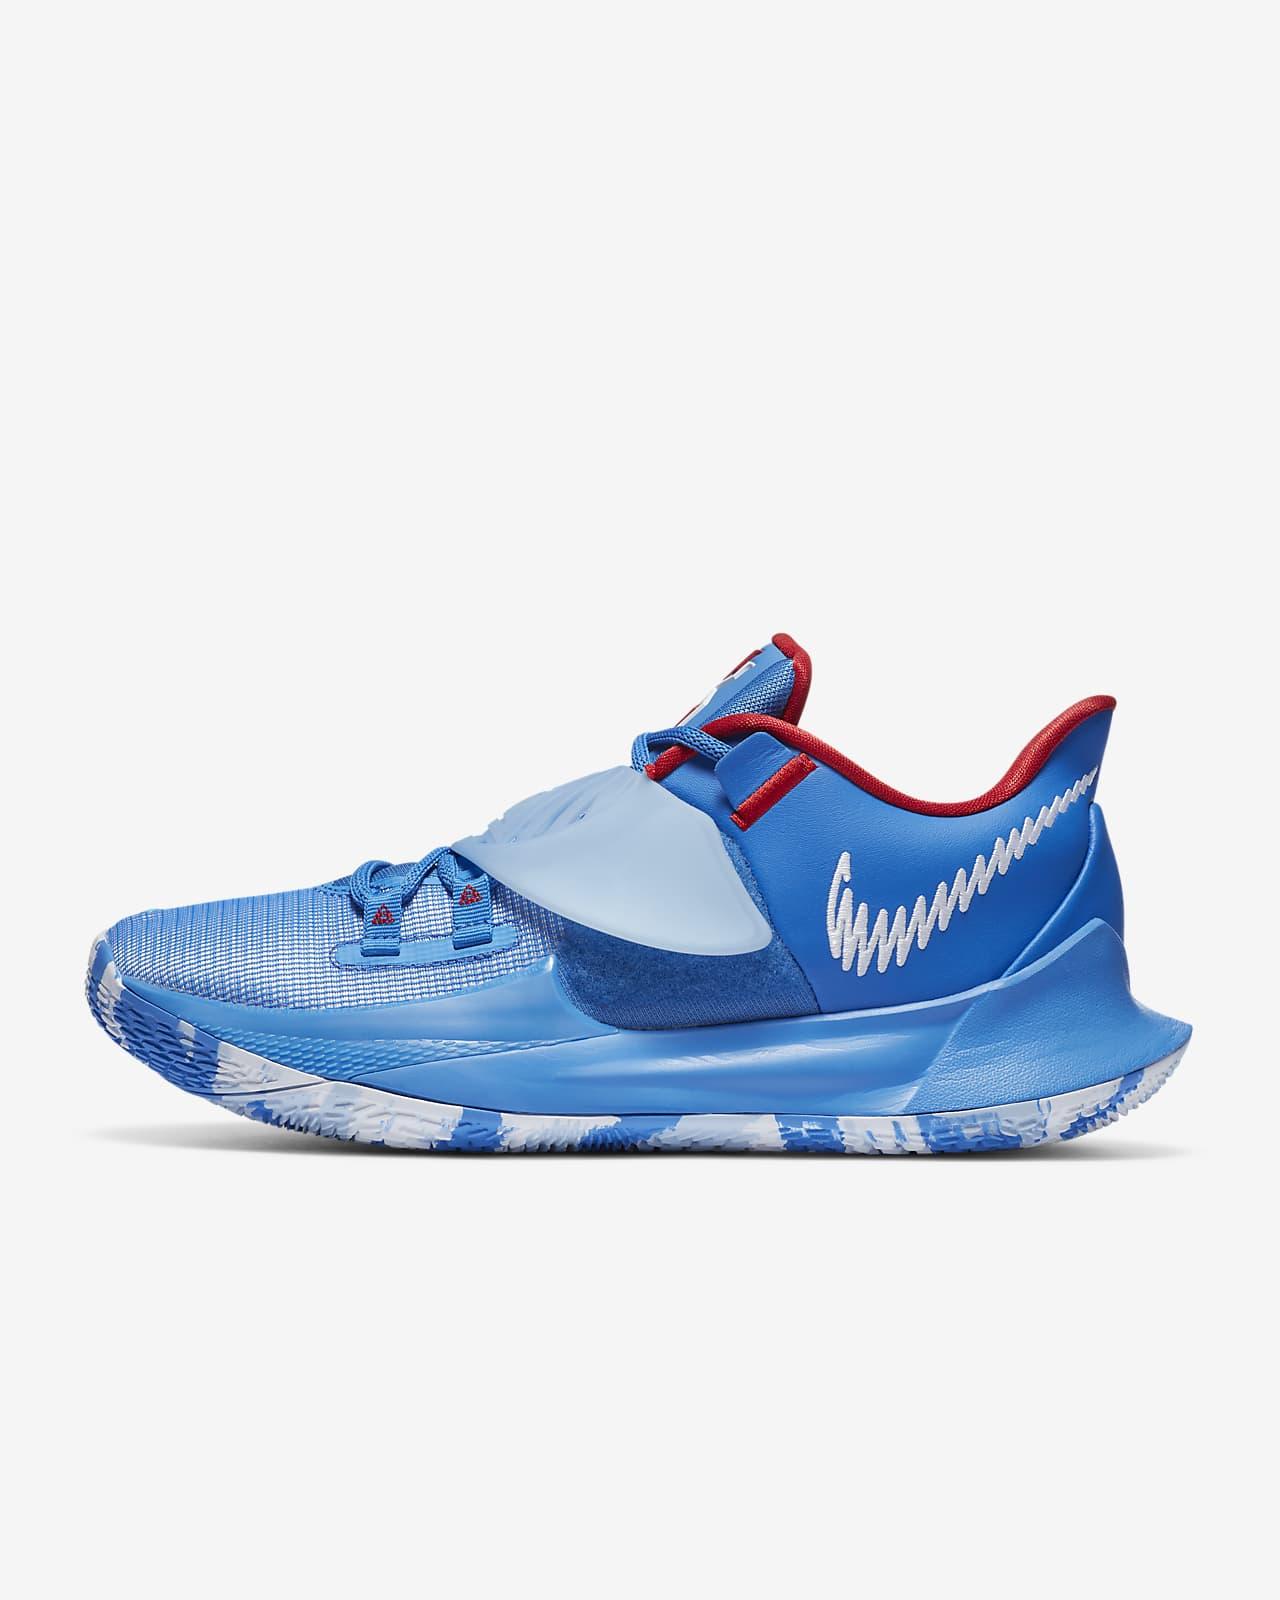 Kyrie Low 3 Basketball Shoe. Nike AE